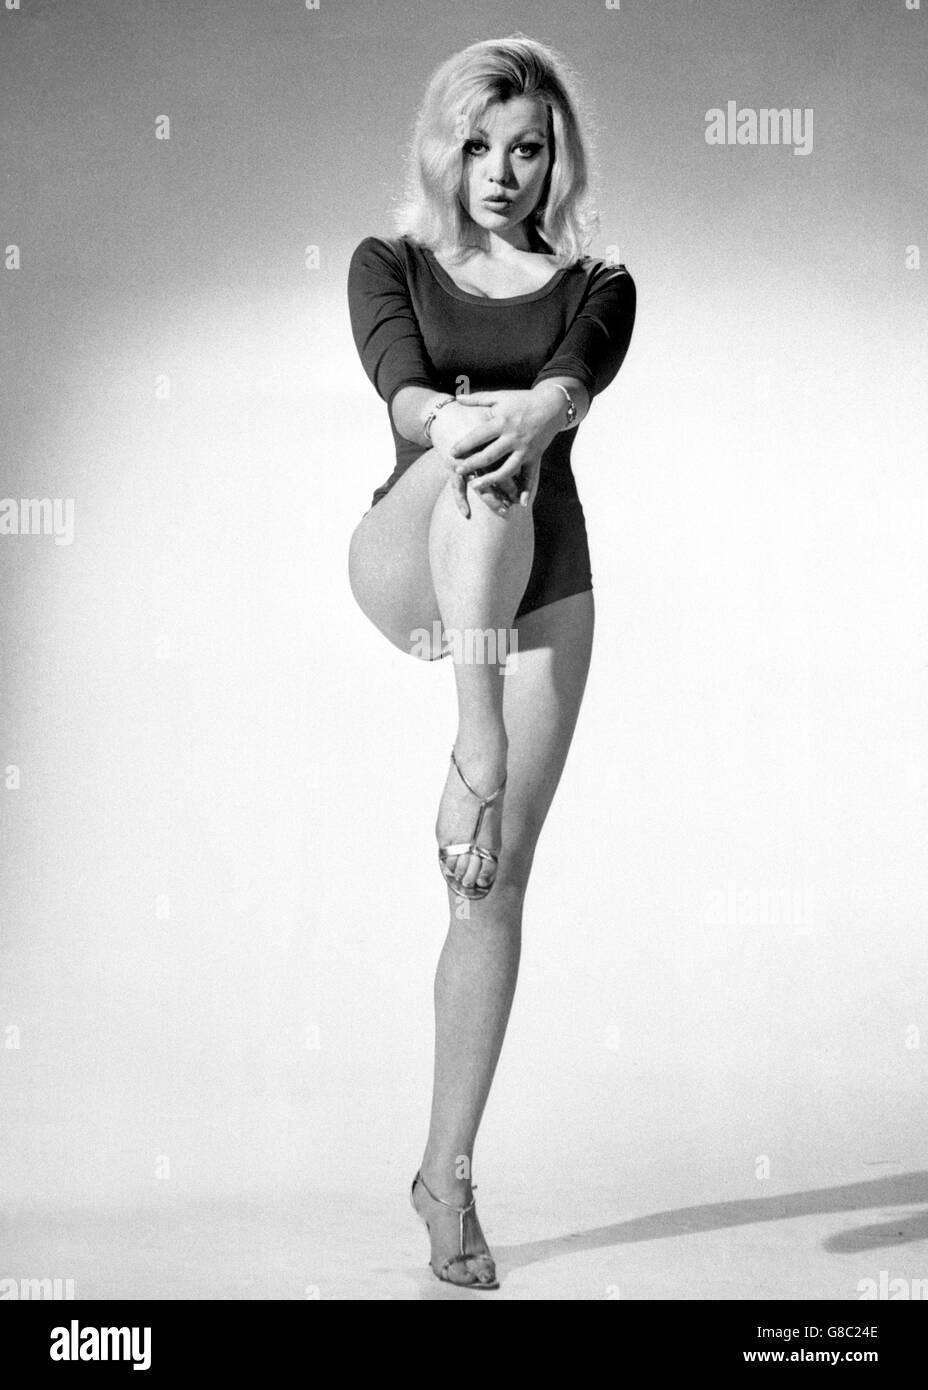 Margaret Nolan nudes (29 photos), Topless, Sideboobs, Feet, cleavage 2006